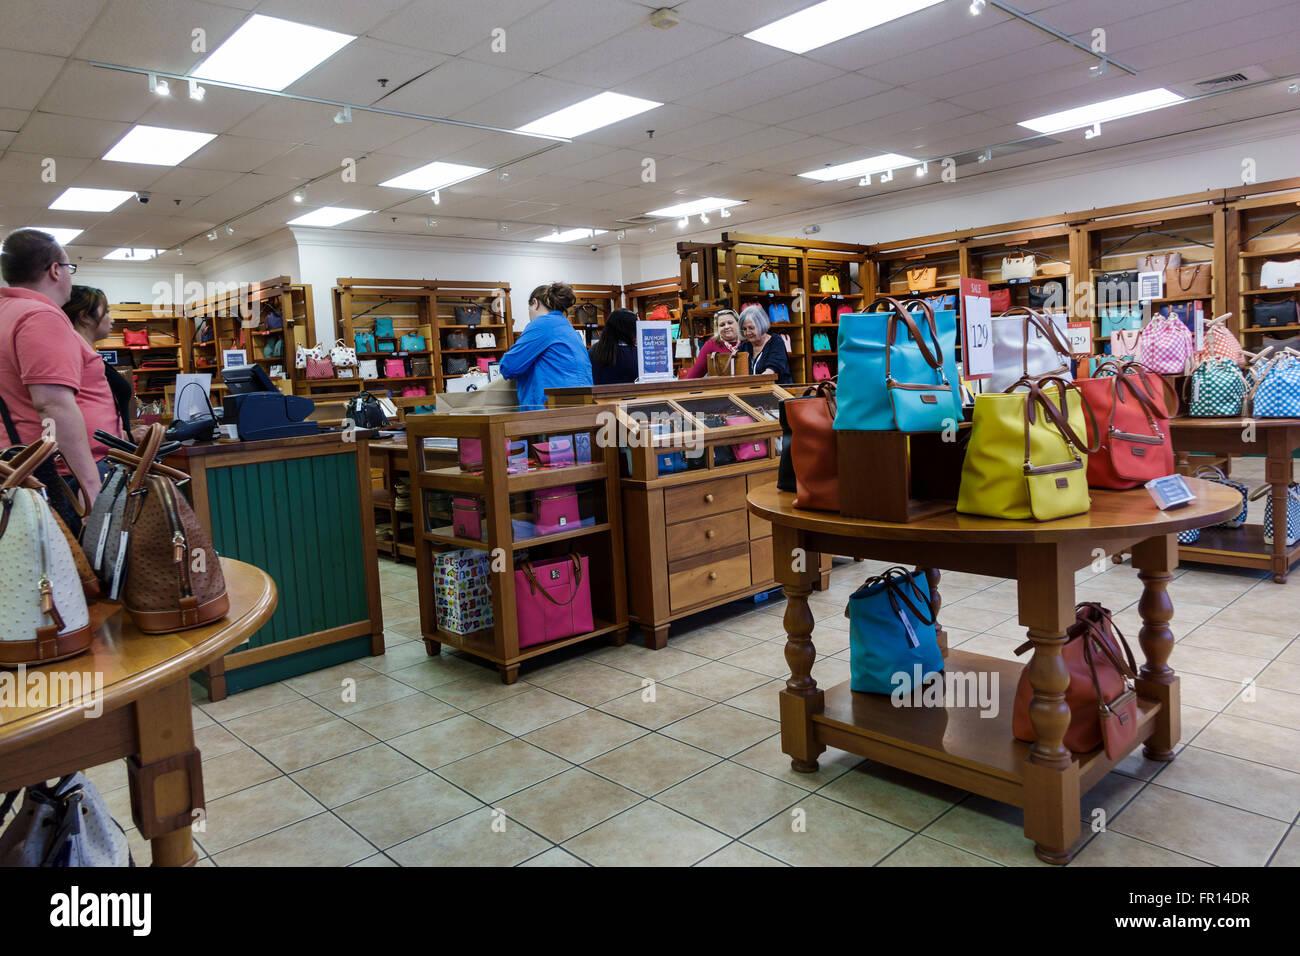 Florida FL Vero Beach Vero Beach Outlets shopping Dooney & Bourke